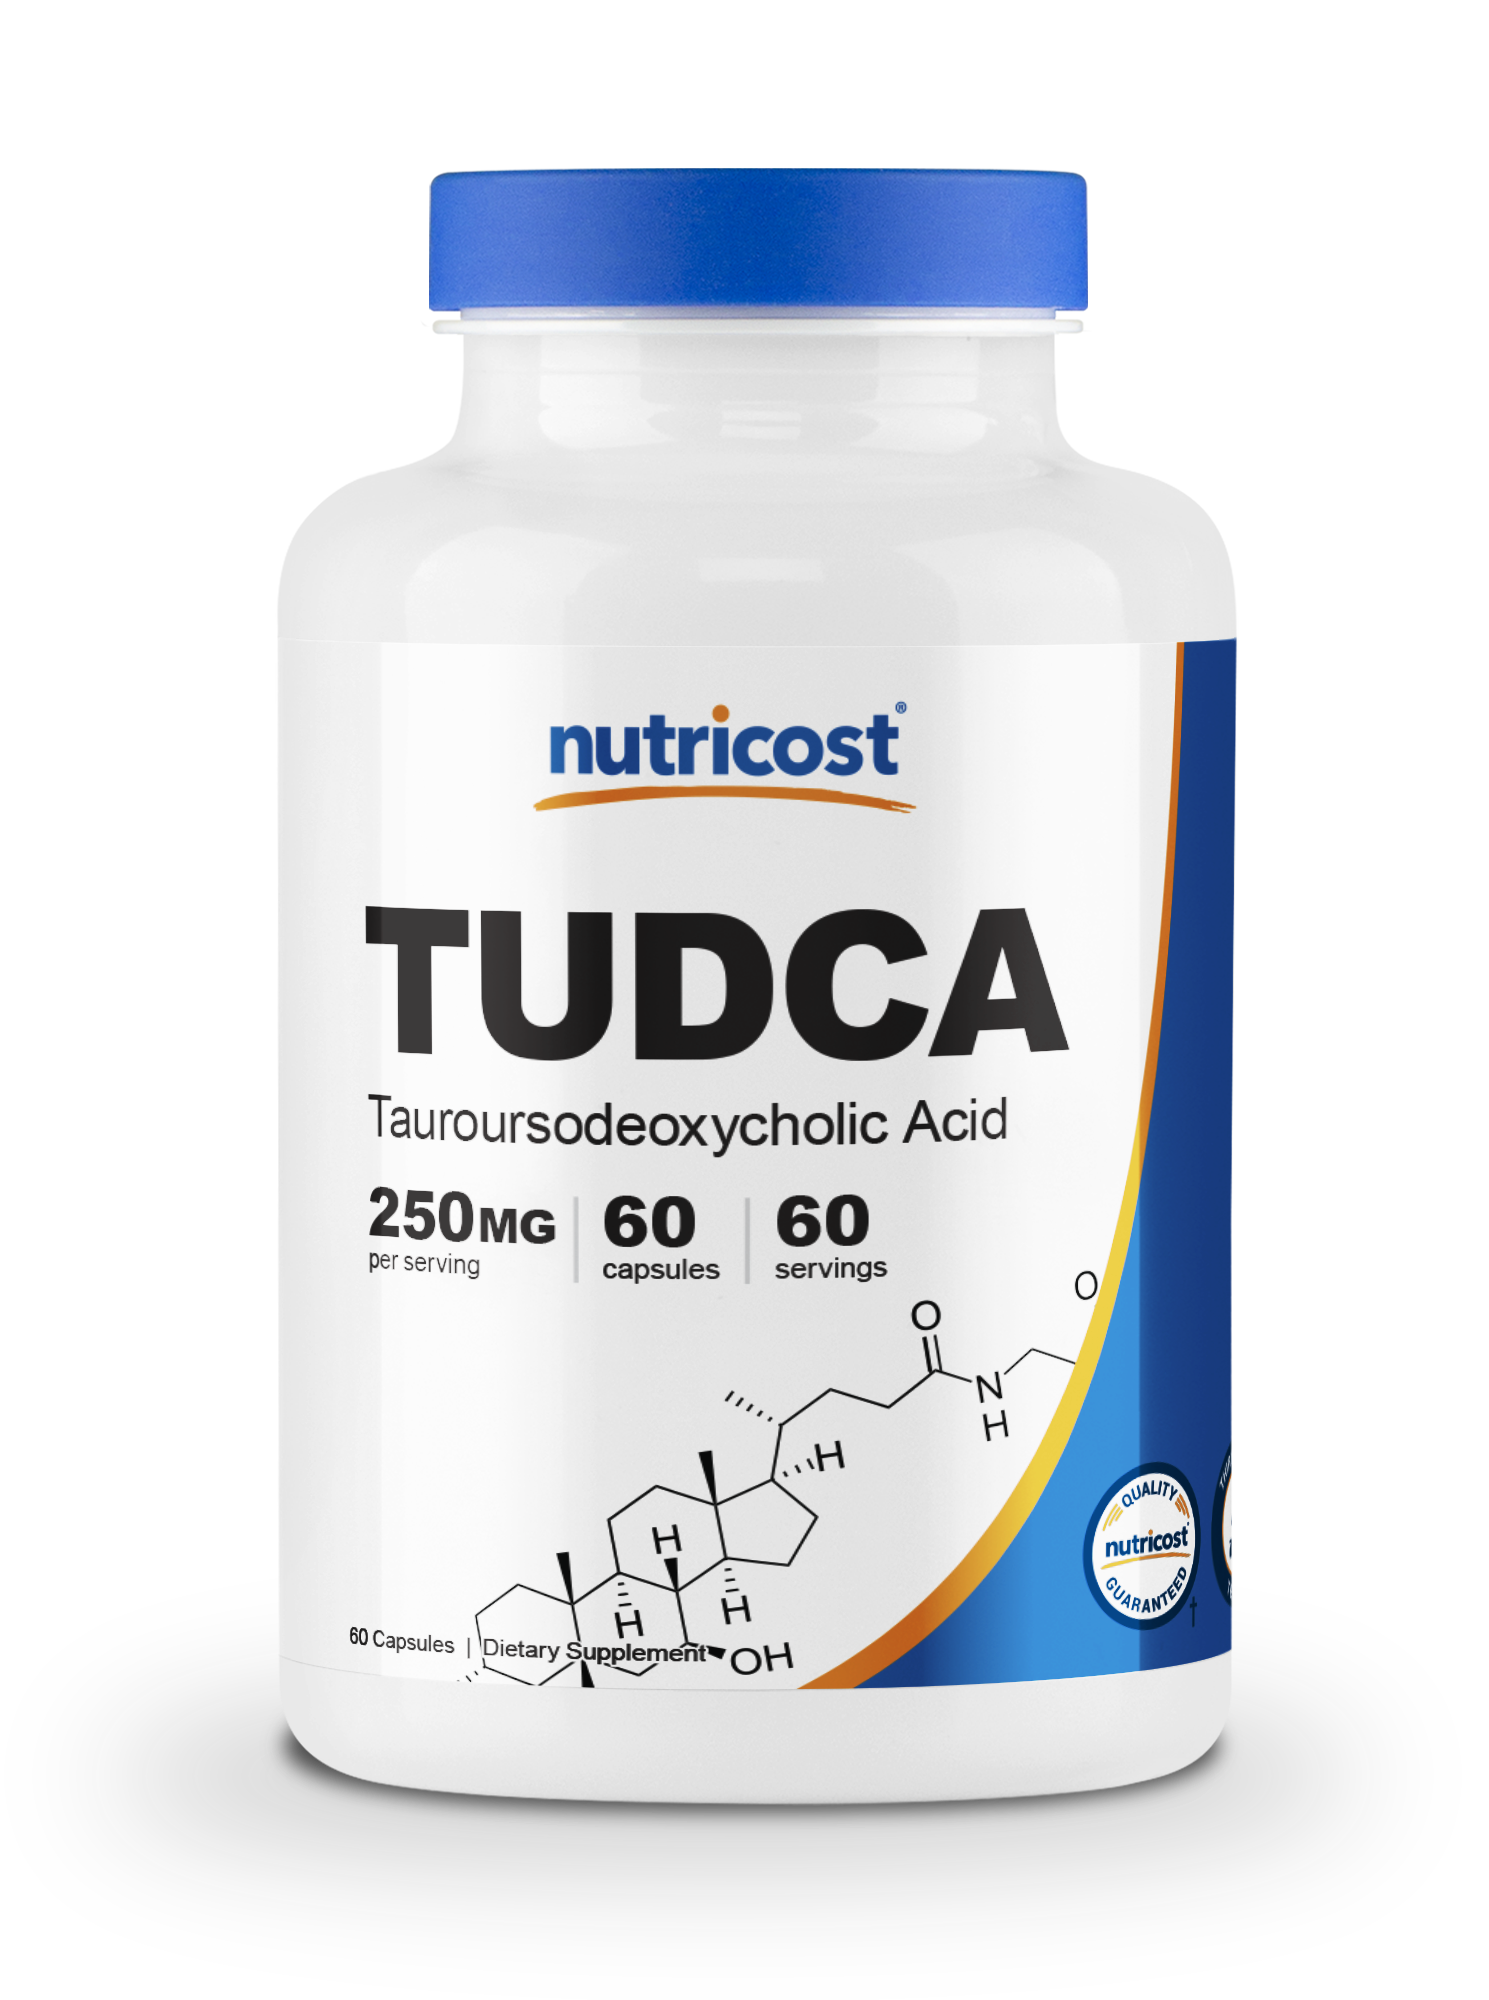 Nutricost Tudca